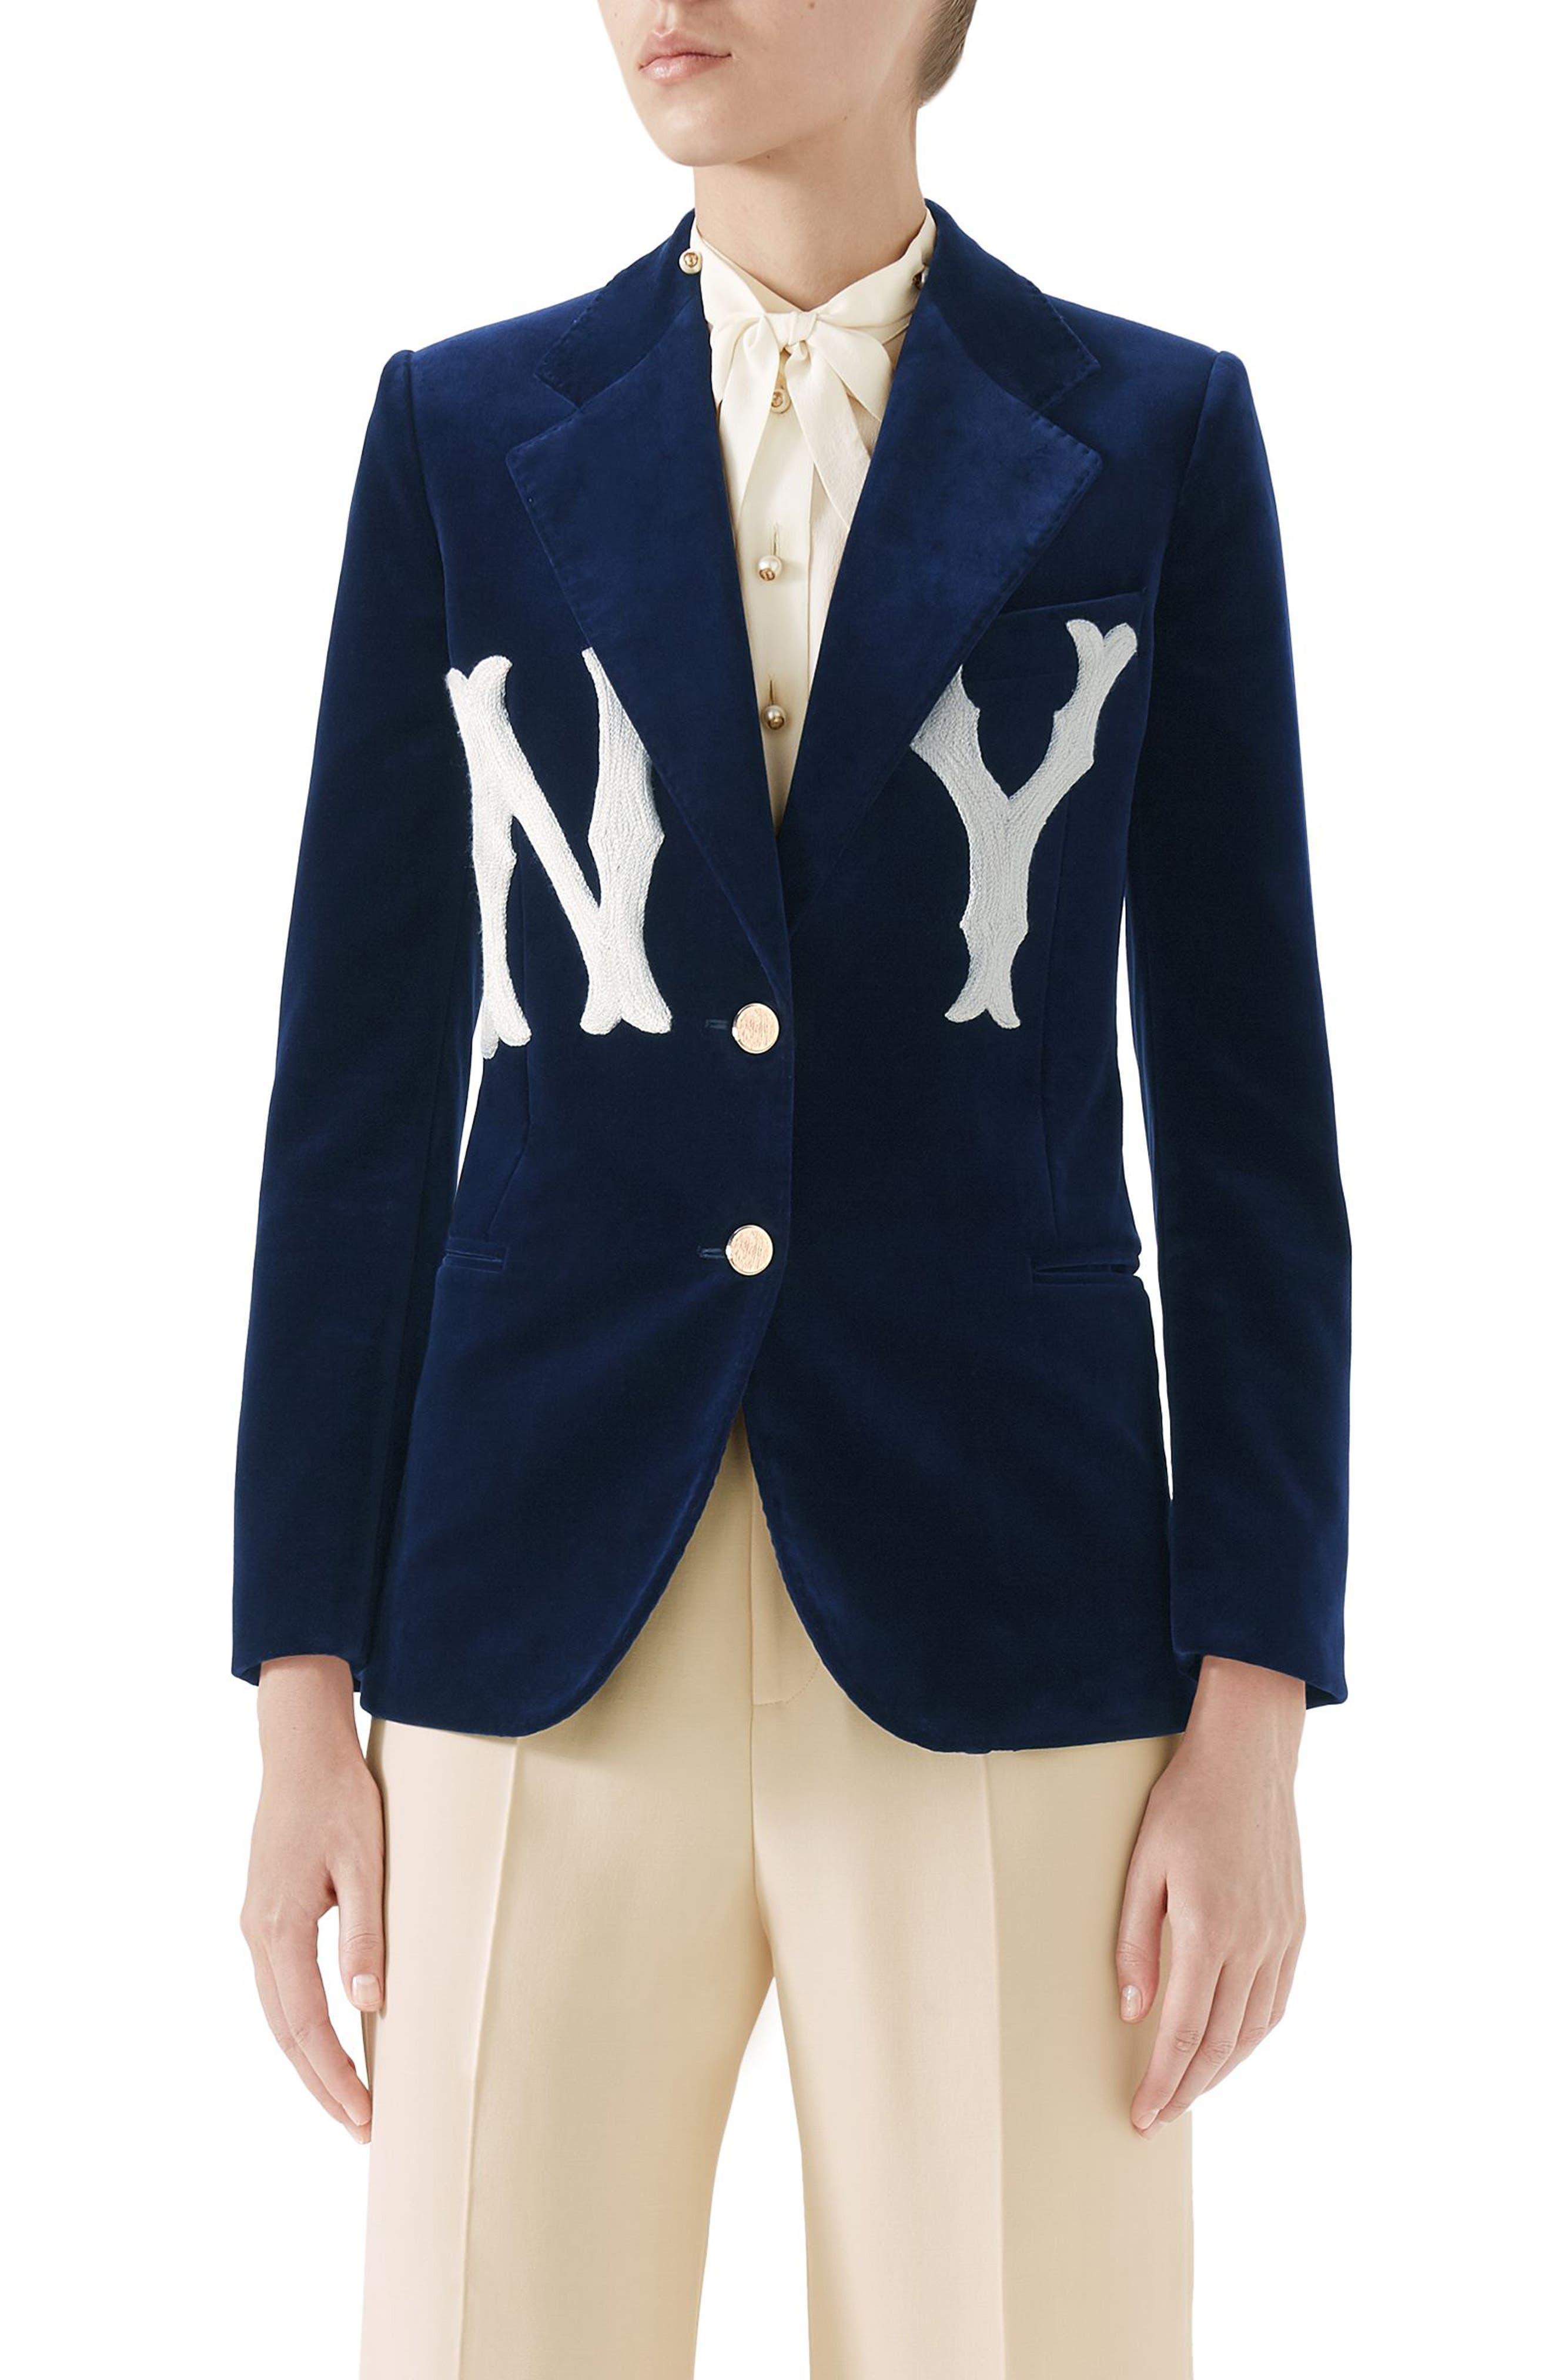 NY Patch Velvet Jacket,                             Main thumbnail 1, color,                             BLUE